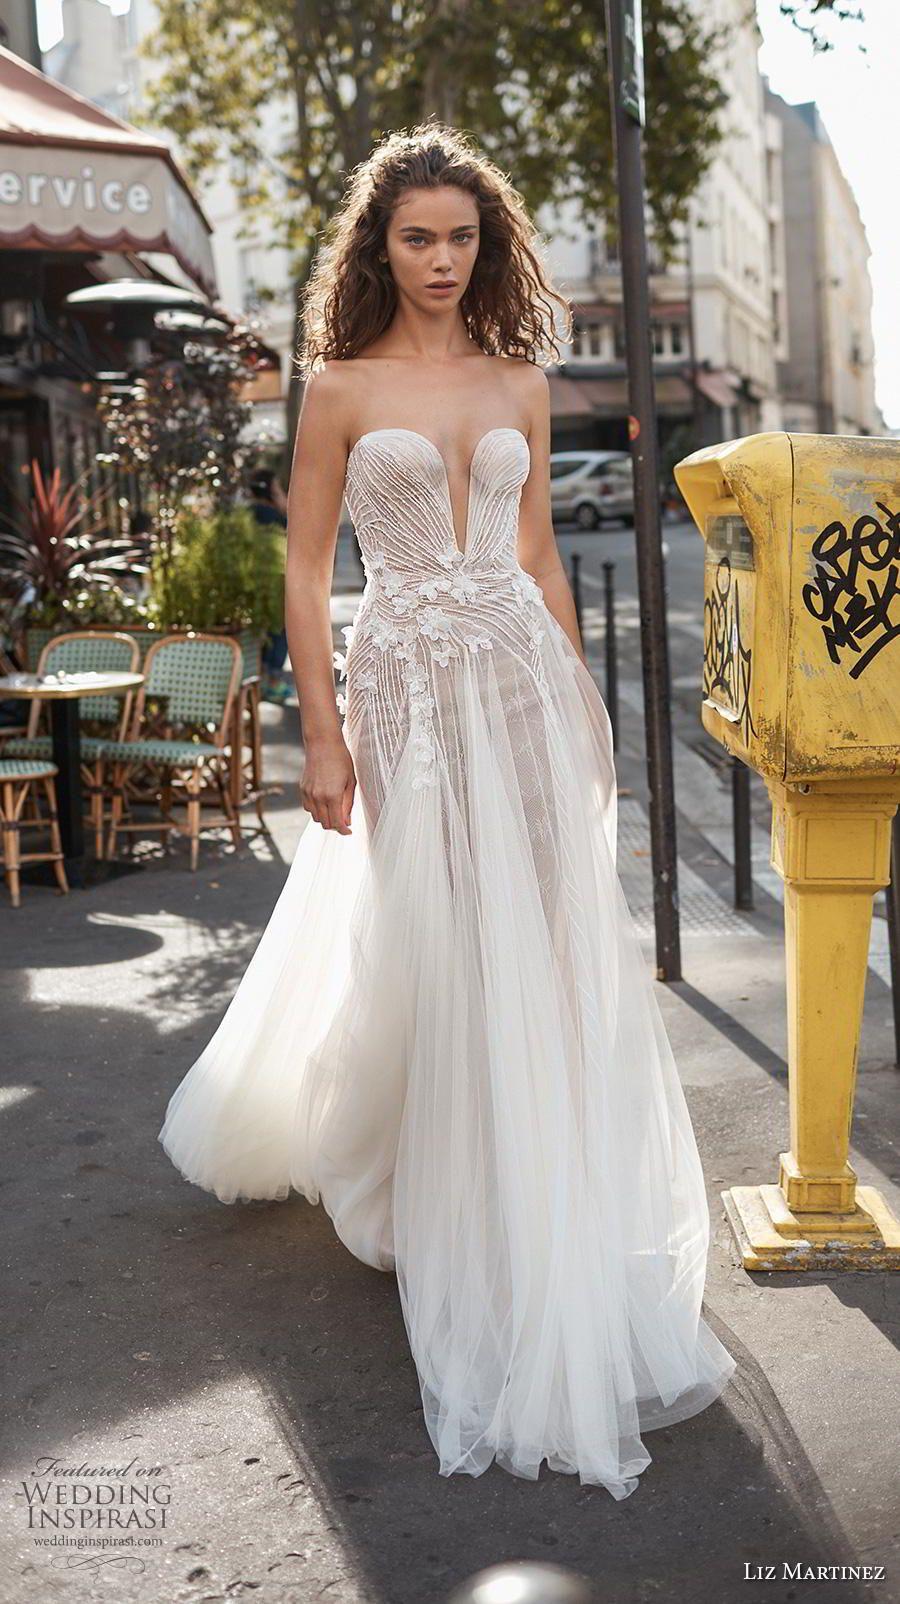 Liz Martinez 2020 Wedding Dresses Amour Bridal Collection Wedding Inspirasi Wedding Dresses Occasion Dresses Wedding Summer Bridesmaid Dresses [ 1604 x 900 Pixel ]